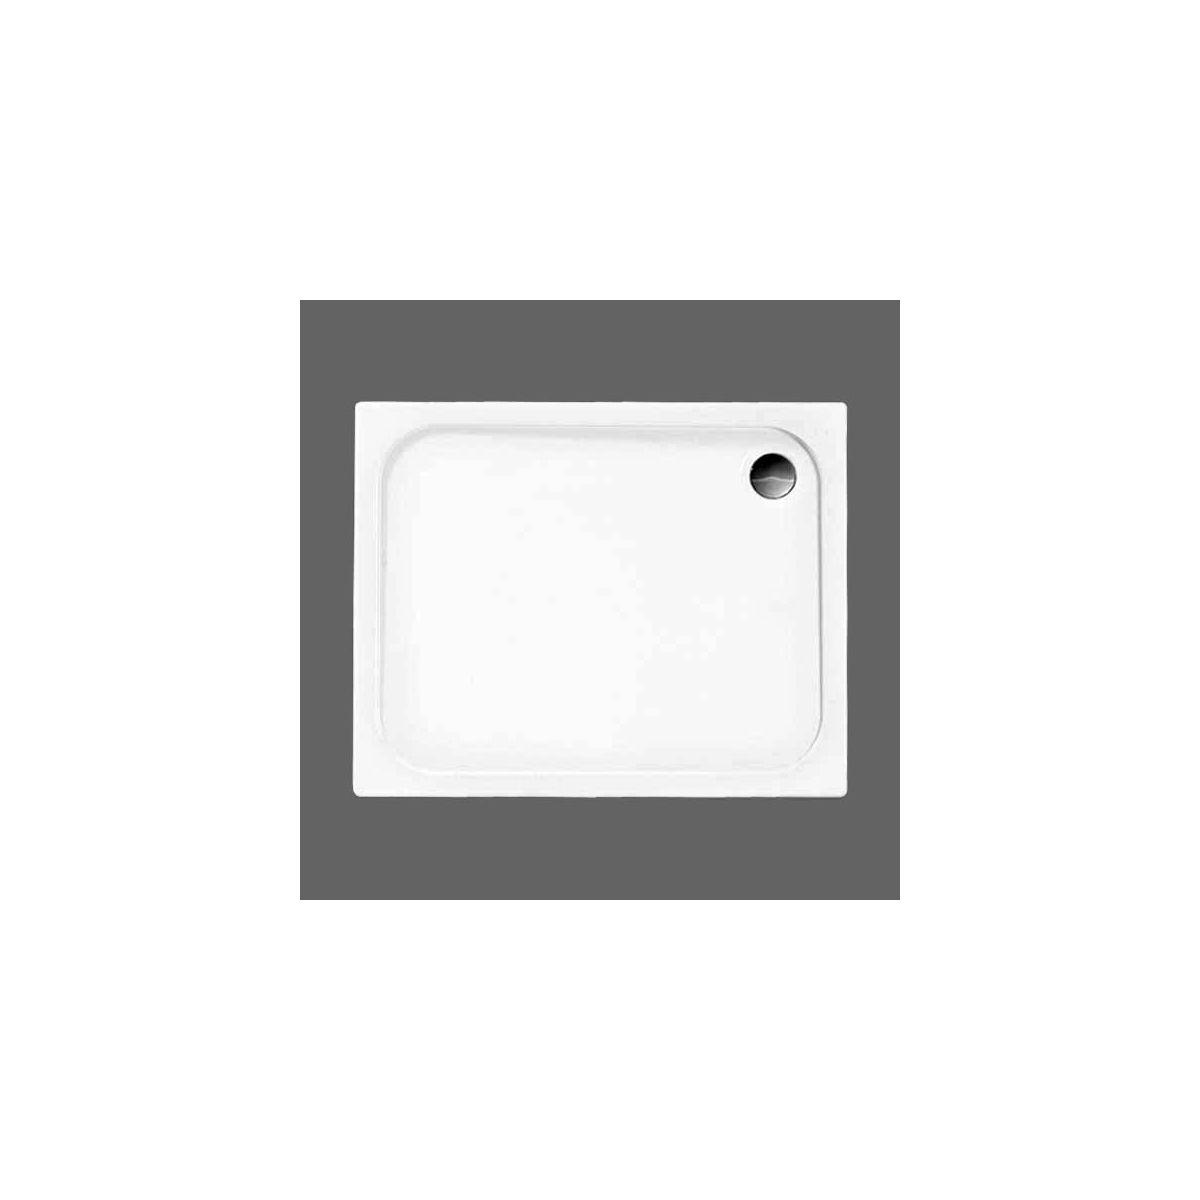 merlyn-mstone-rectangular-shower-tray-1600-x-900mm